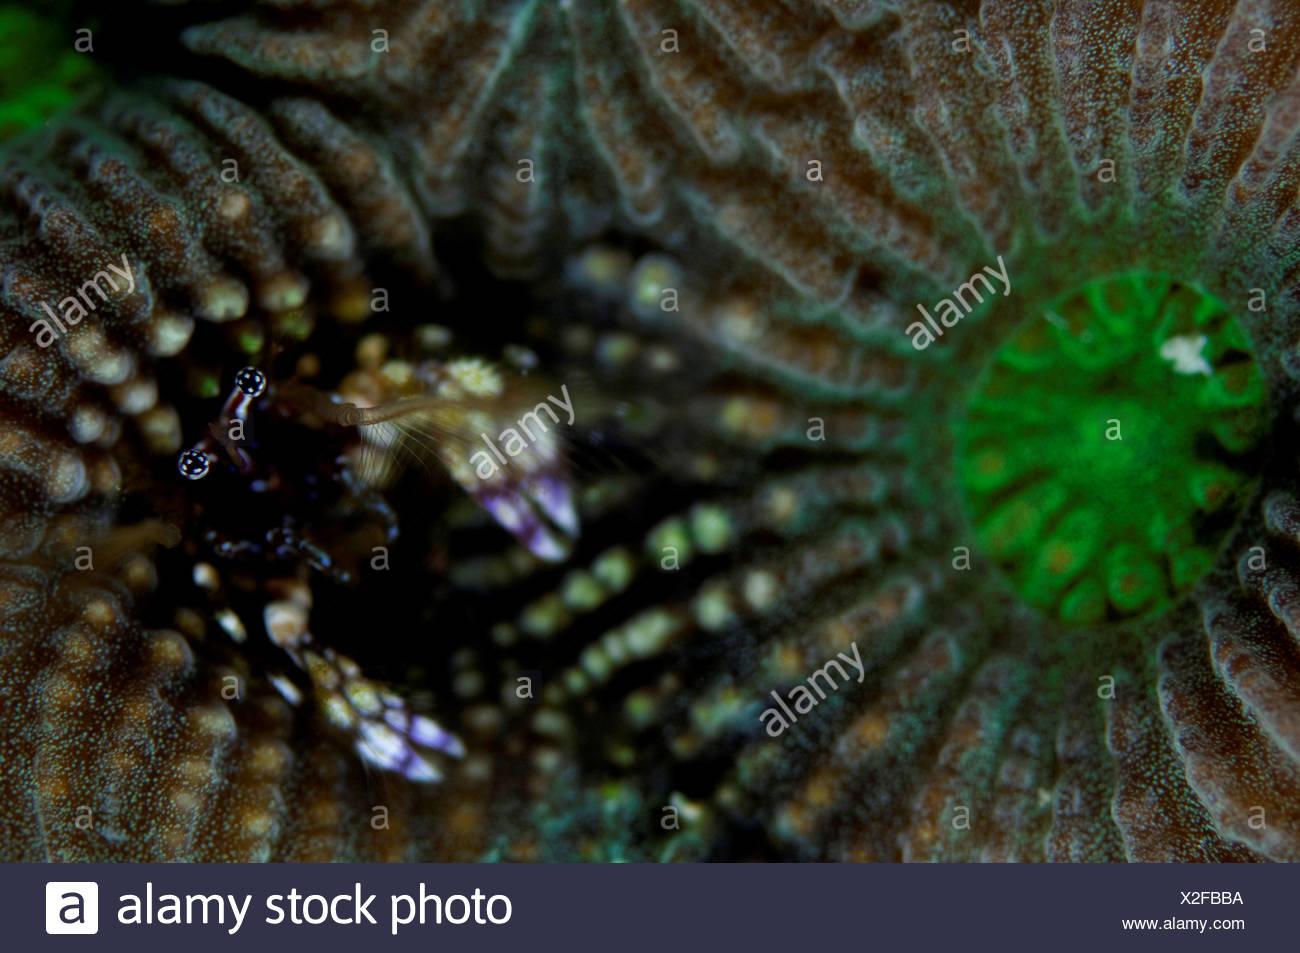 Coral hermit crab (Paguritta harmsi) living in hard coral, Gaafu Alifu Atoll, Maldives Stock Photo